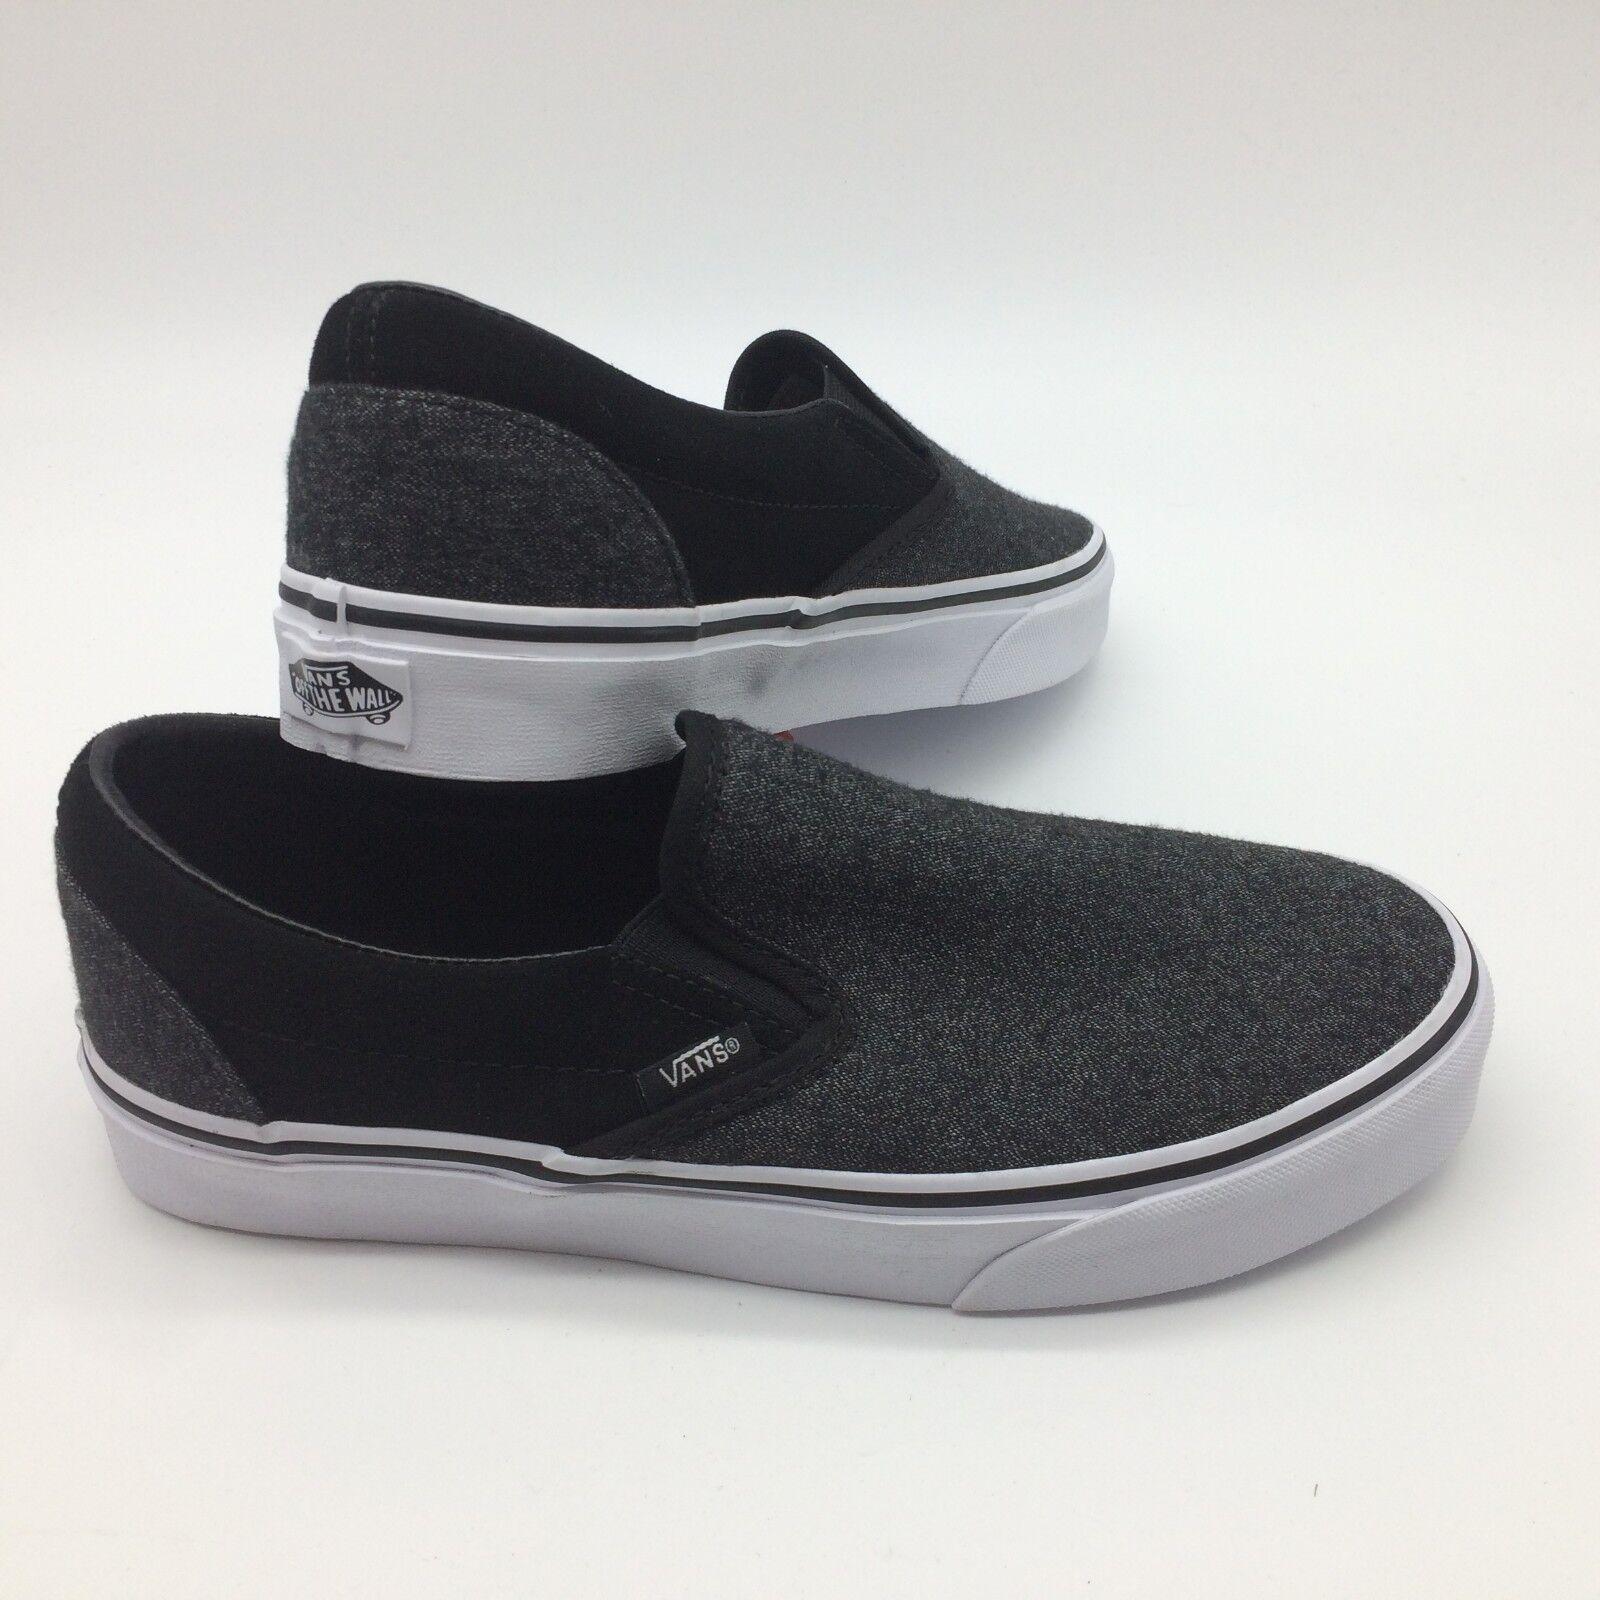 Furgoni scarpe da uomo